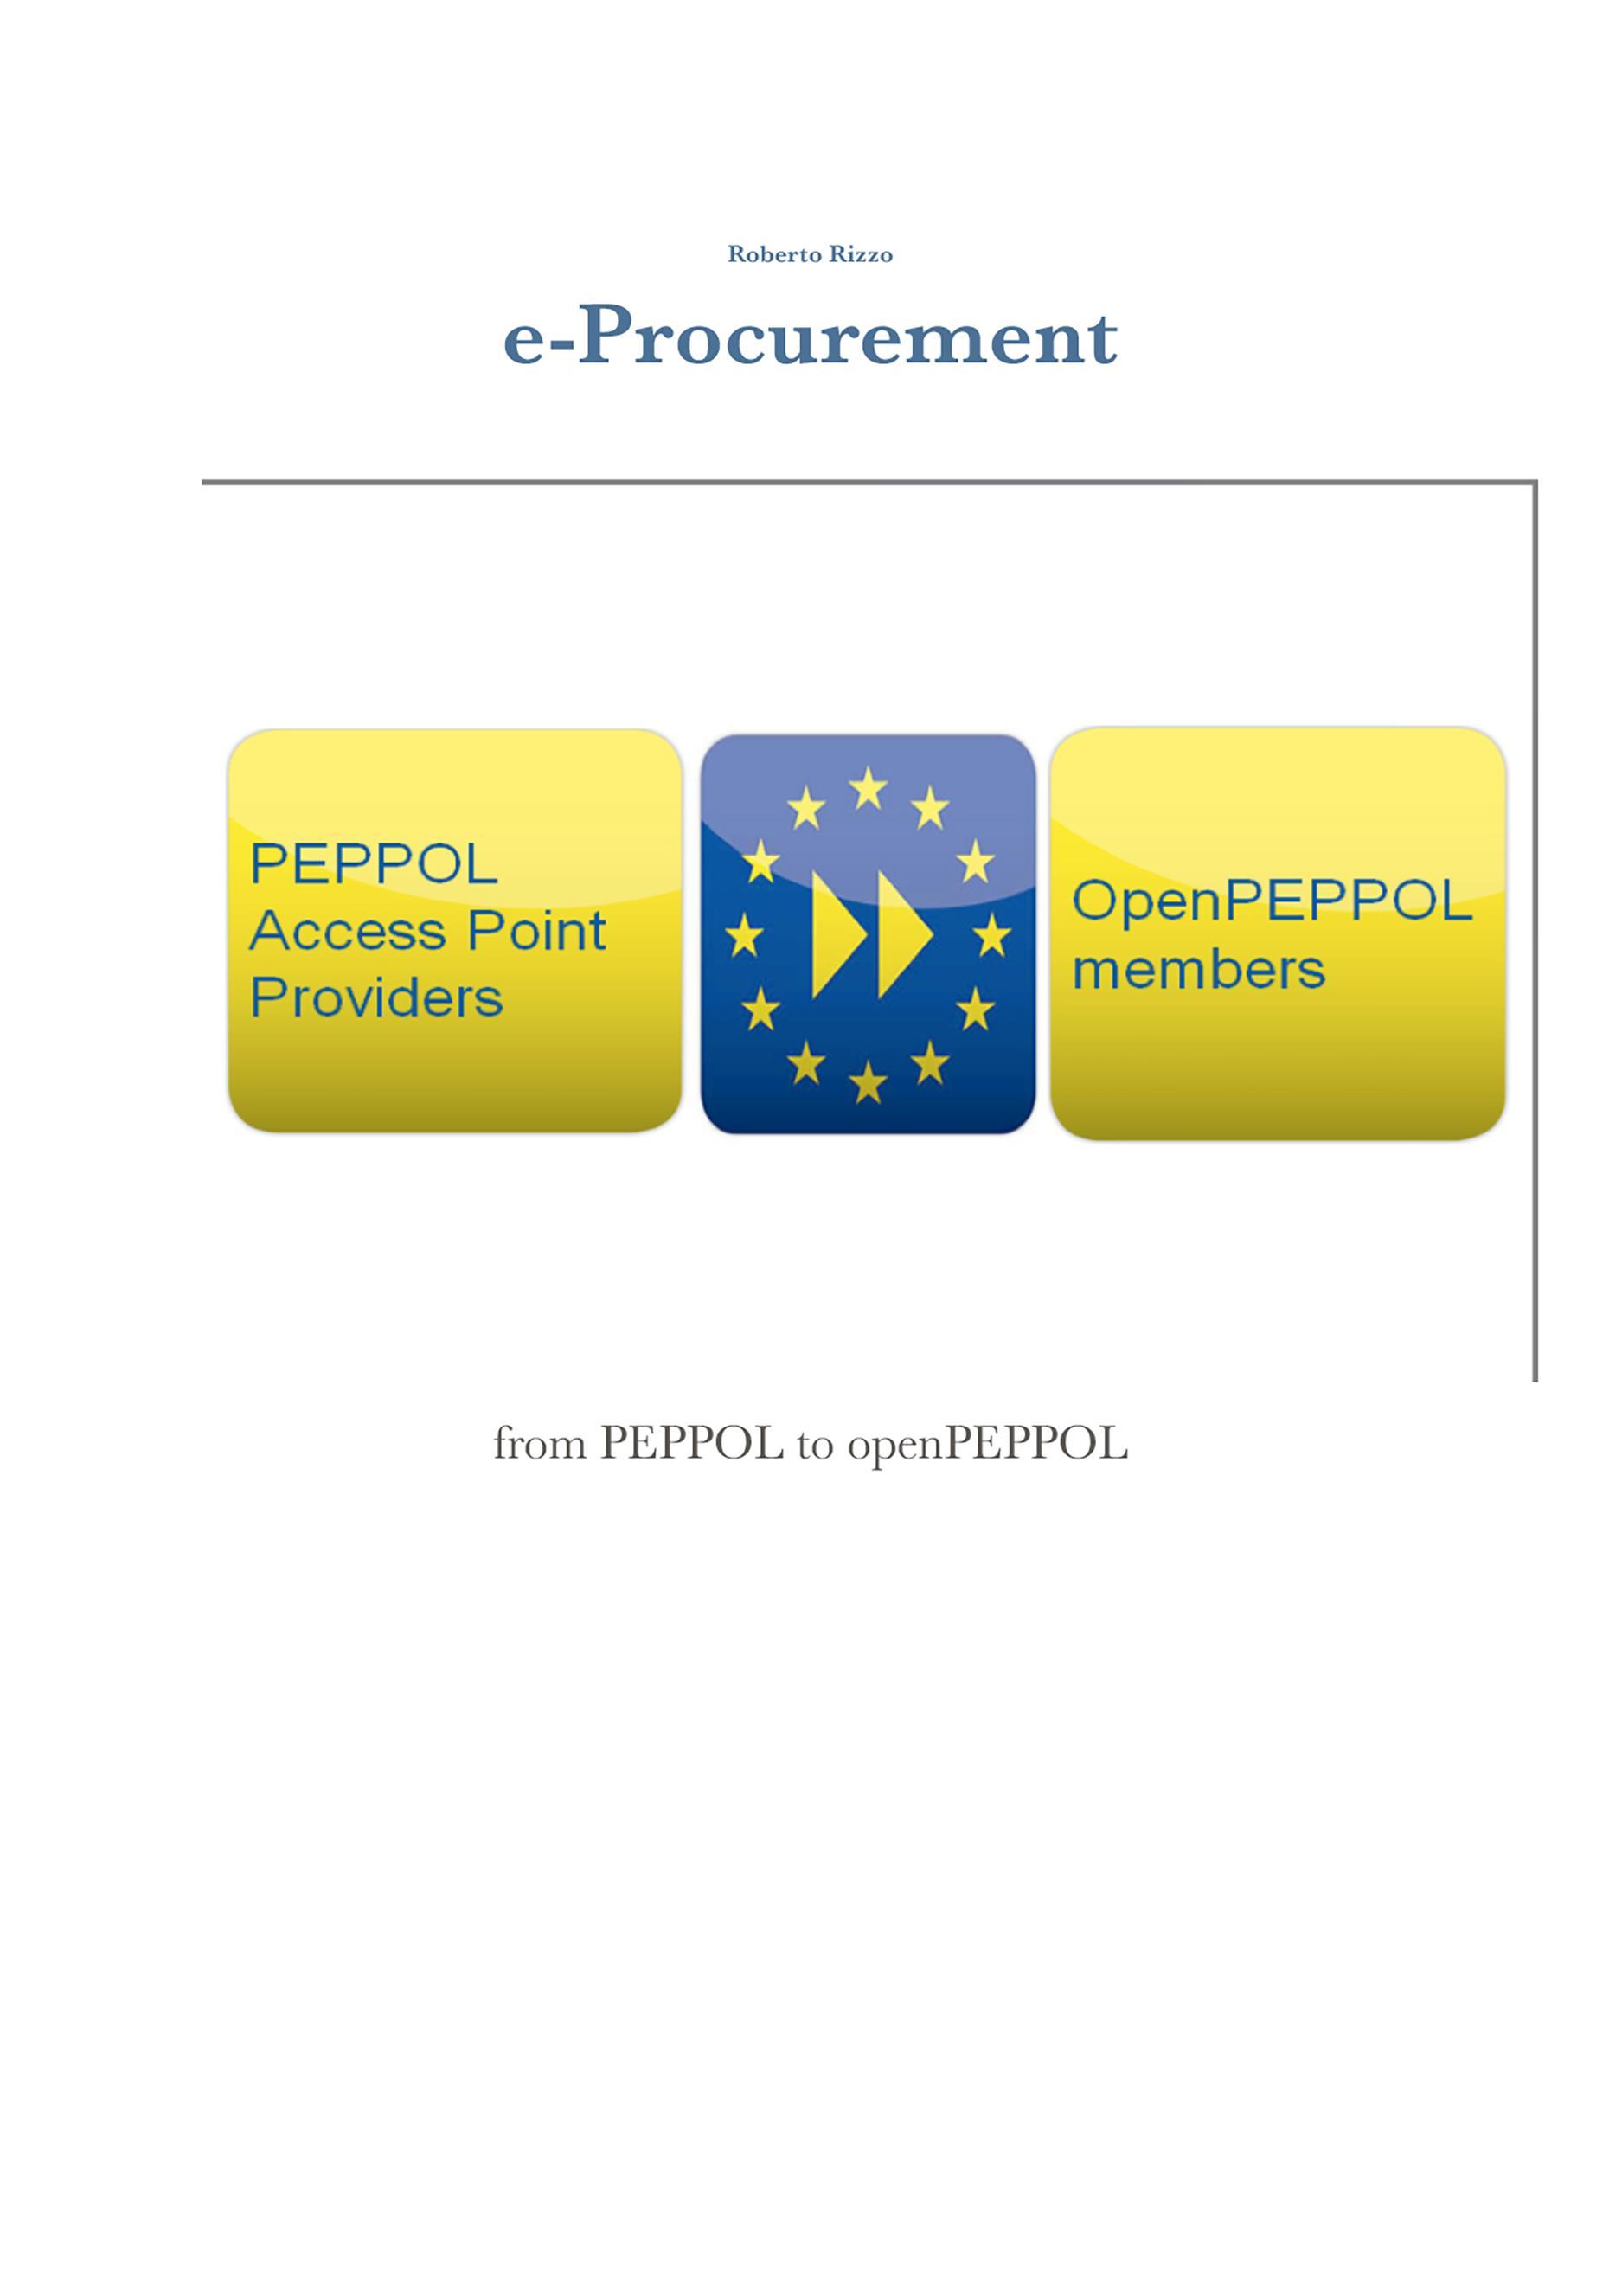 e-Procurement - from PEPPOL to openPEPPOL